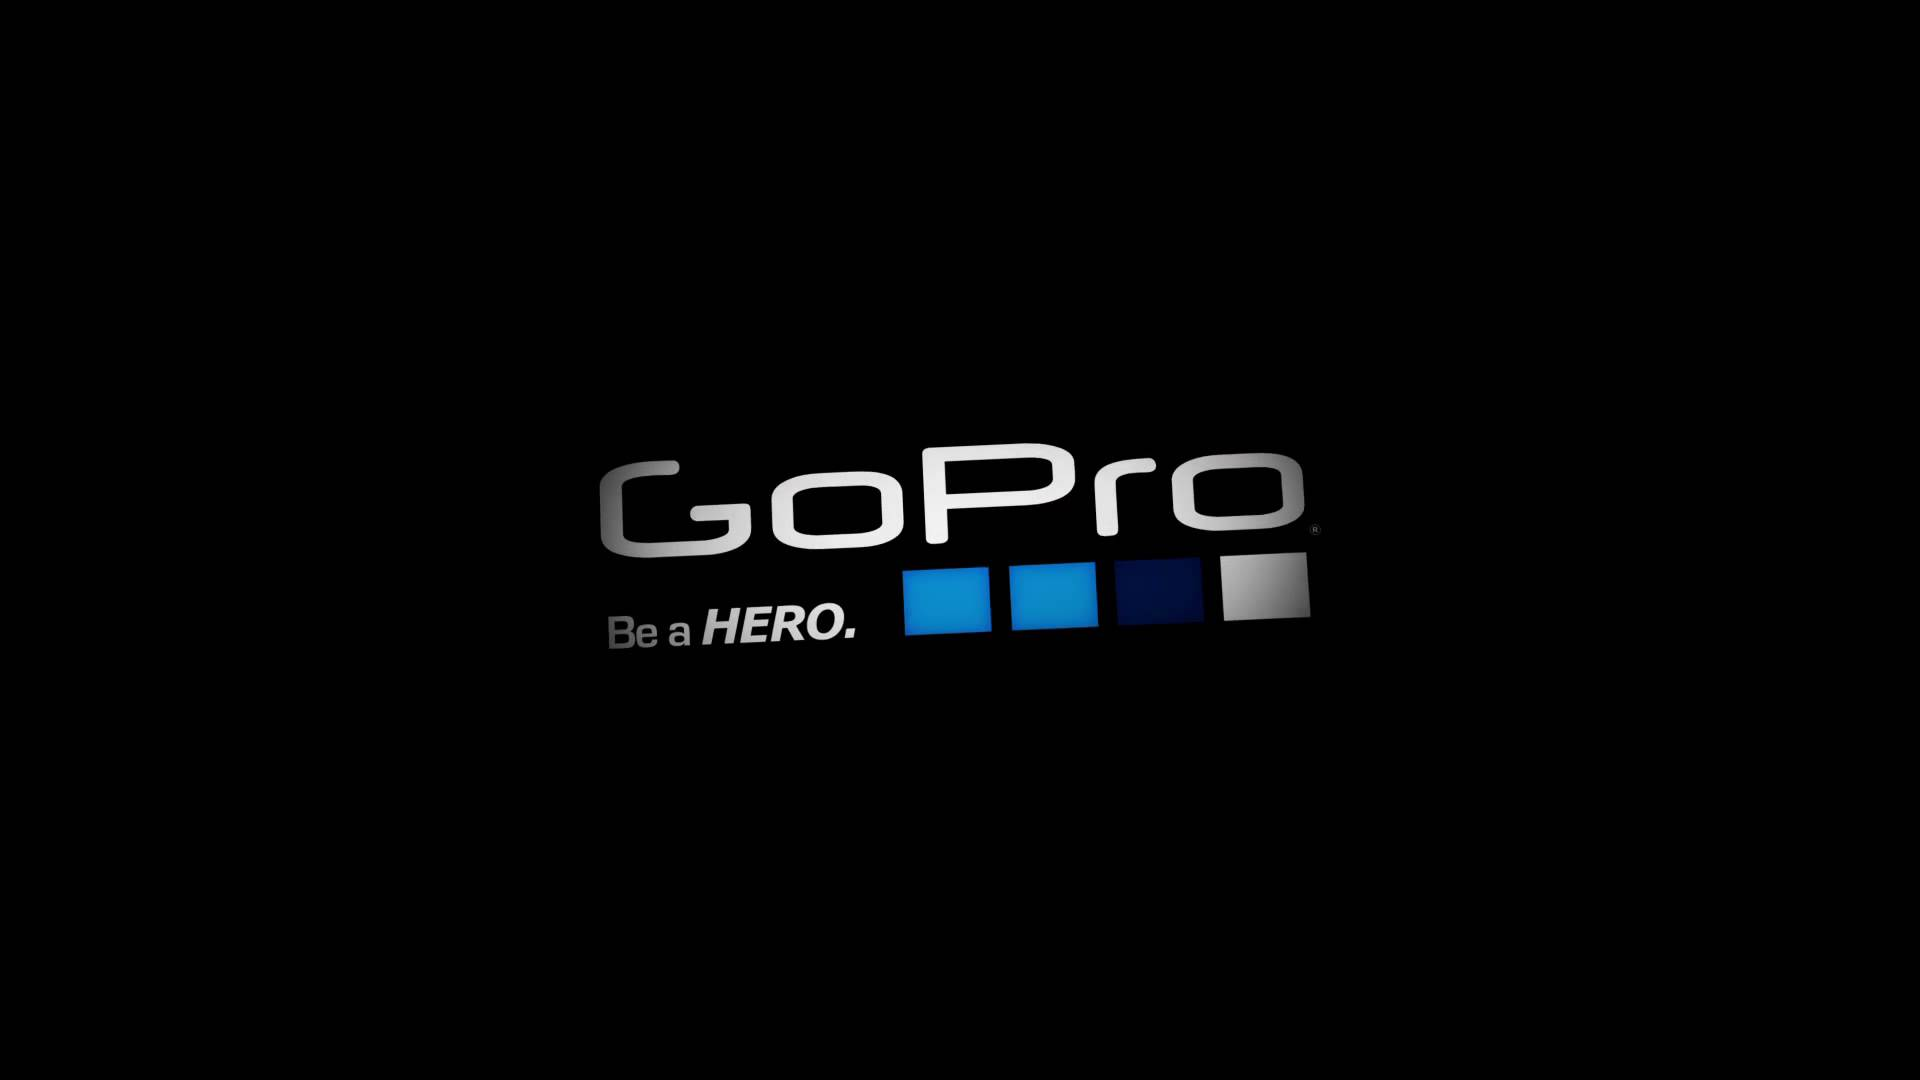 Gopro Wallpaper Gopro hires former skype ceo 1920x1080